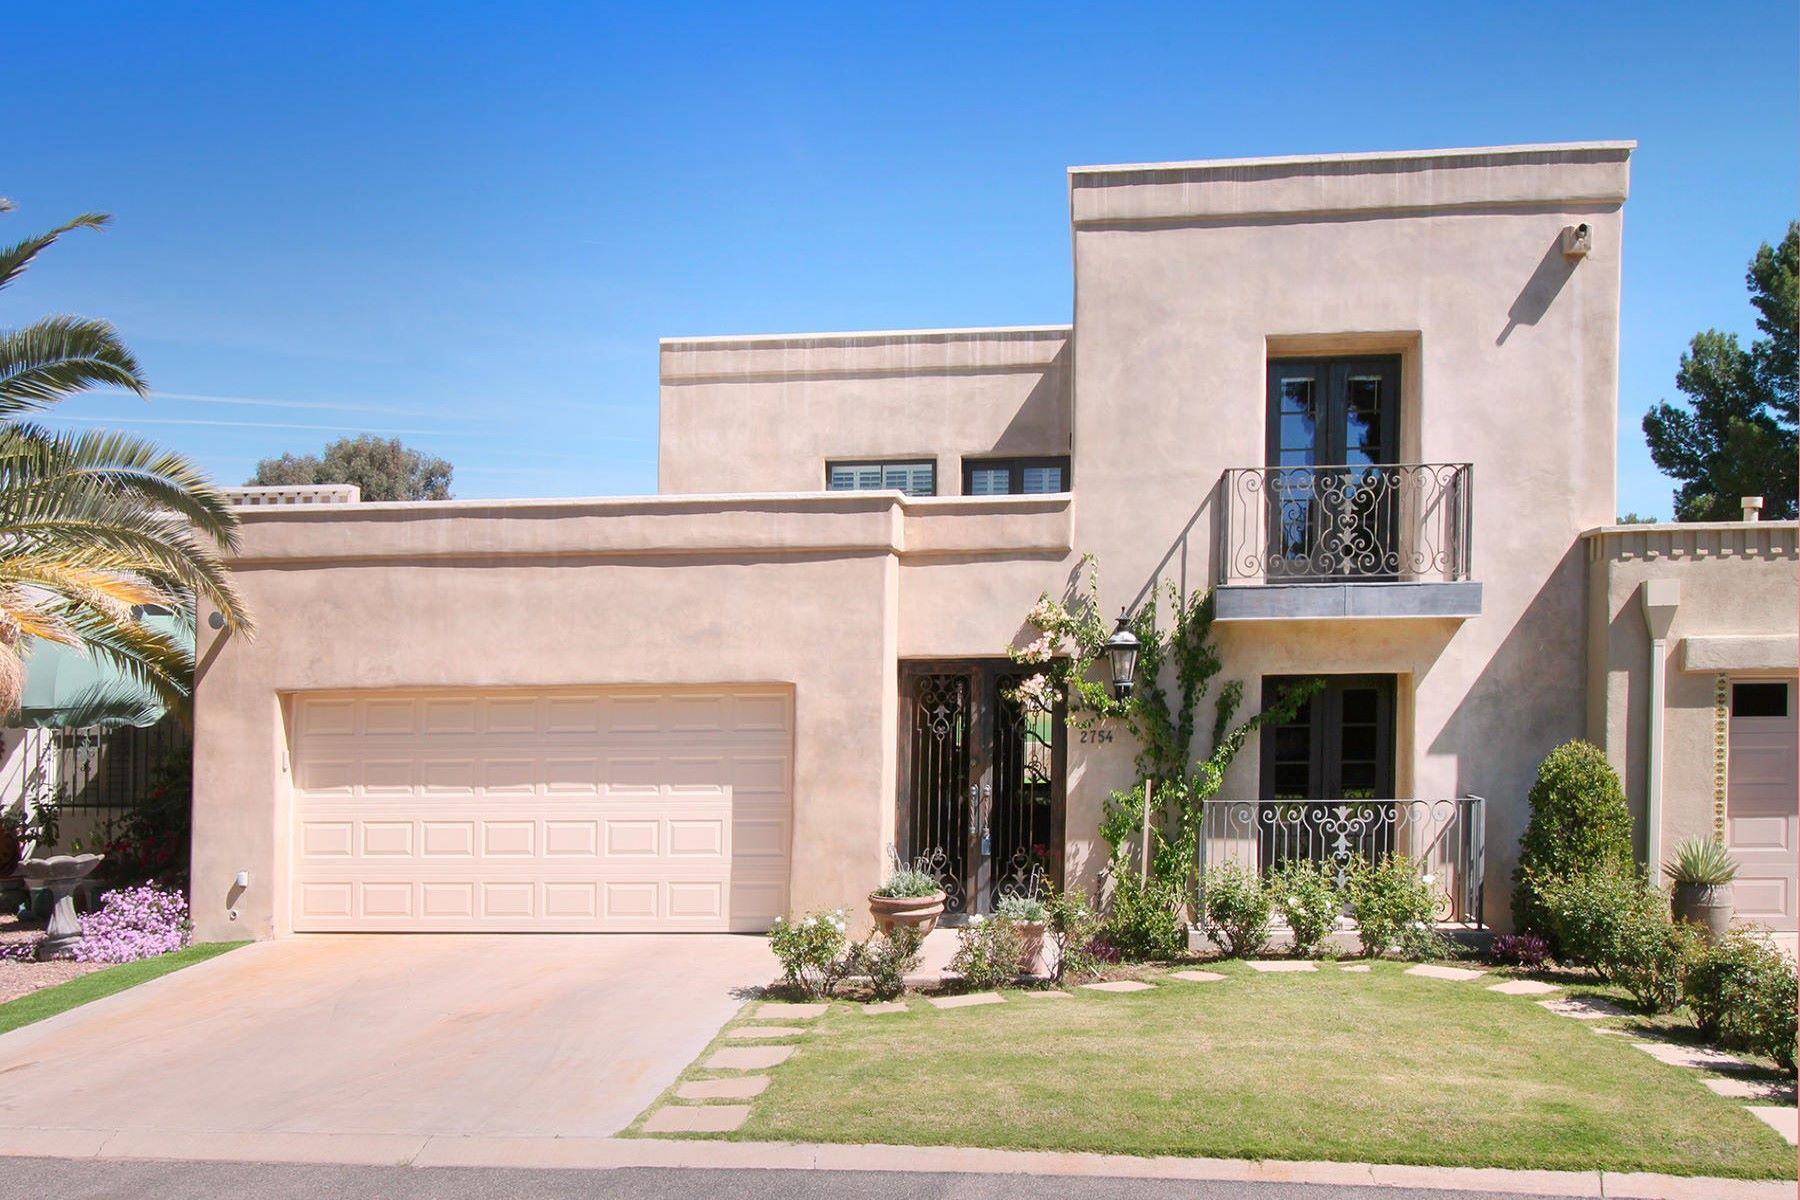 Moradia em banda para Venda às Luxurious Villa in Tucson National 2754 W Magee Road Tucson, Arizona, 85742 Estados Unidos